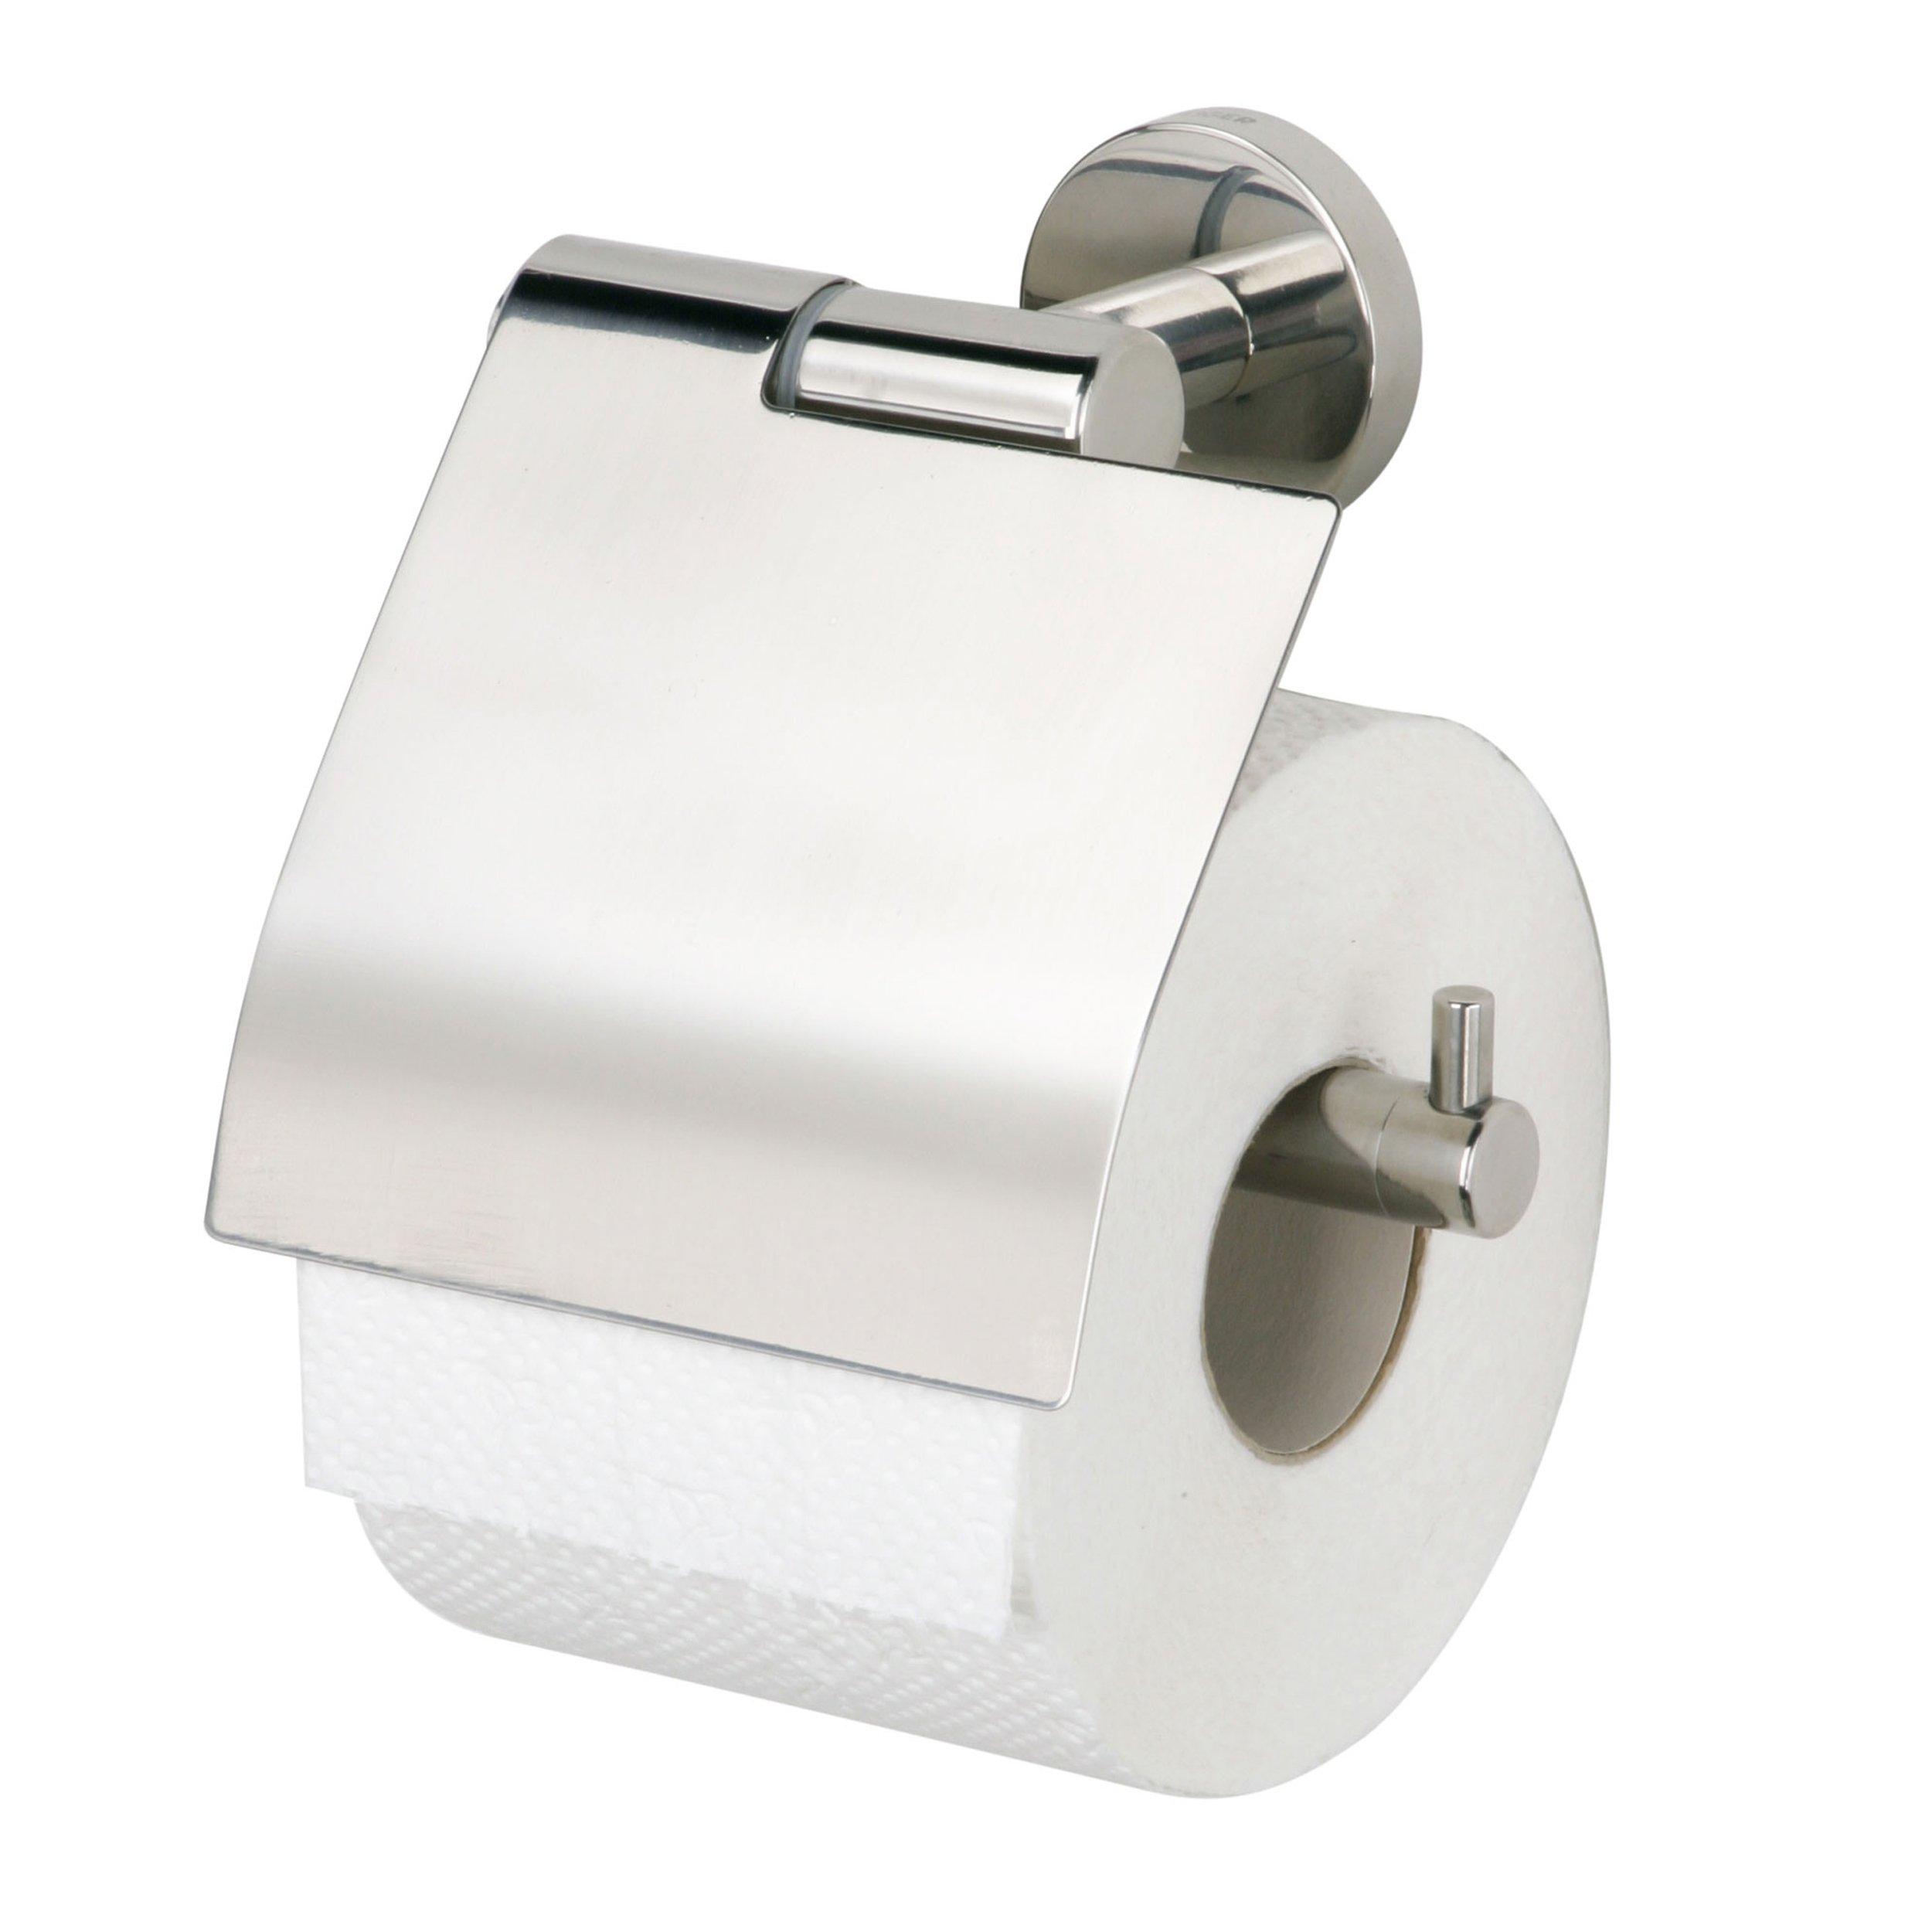 Tiger Boston toiletrolhouder inclusief klep geborsteld RVS